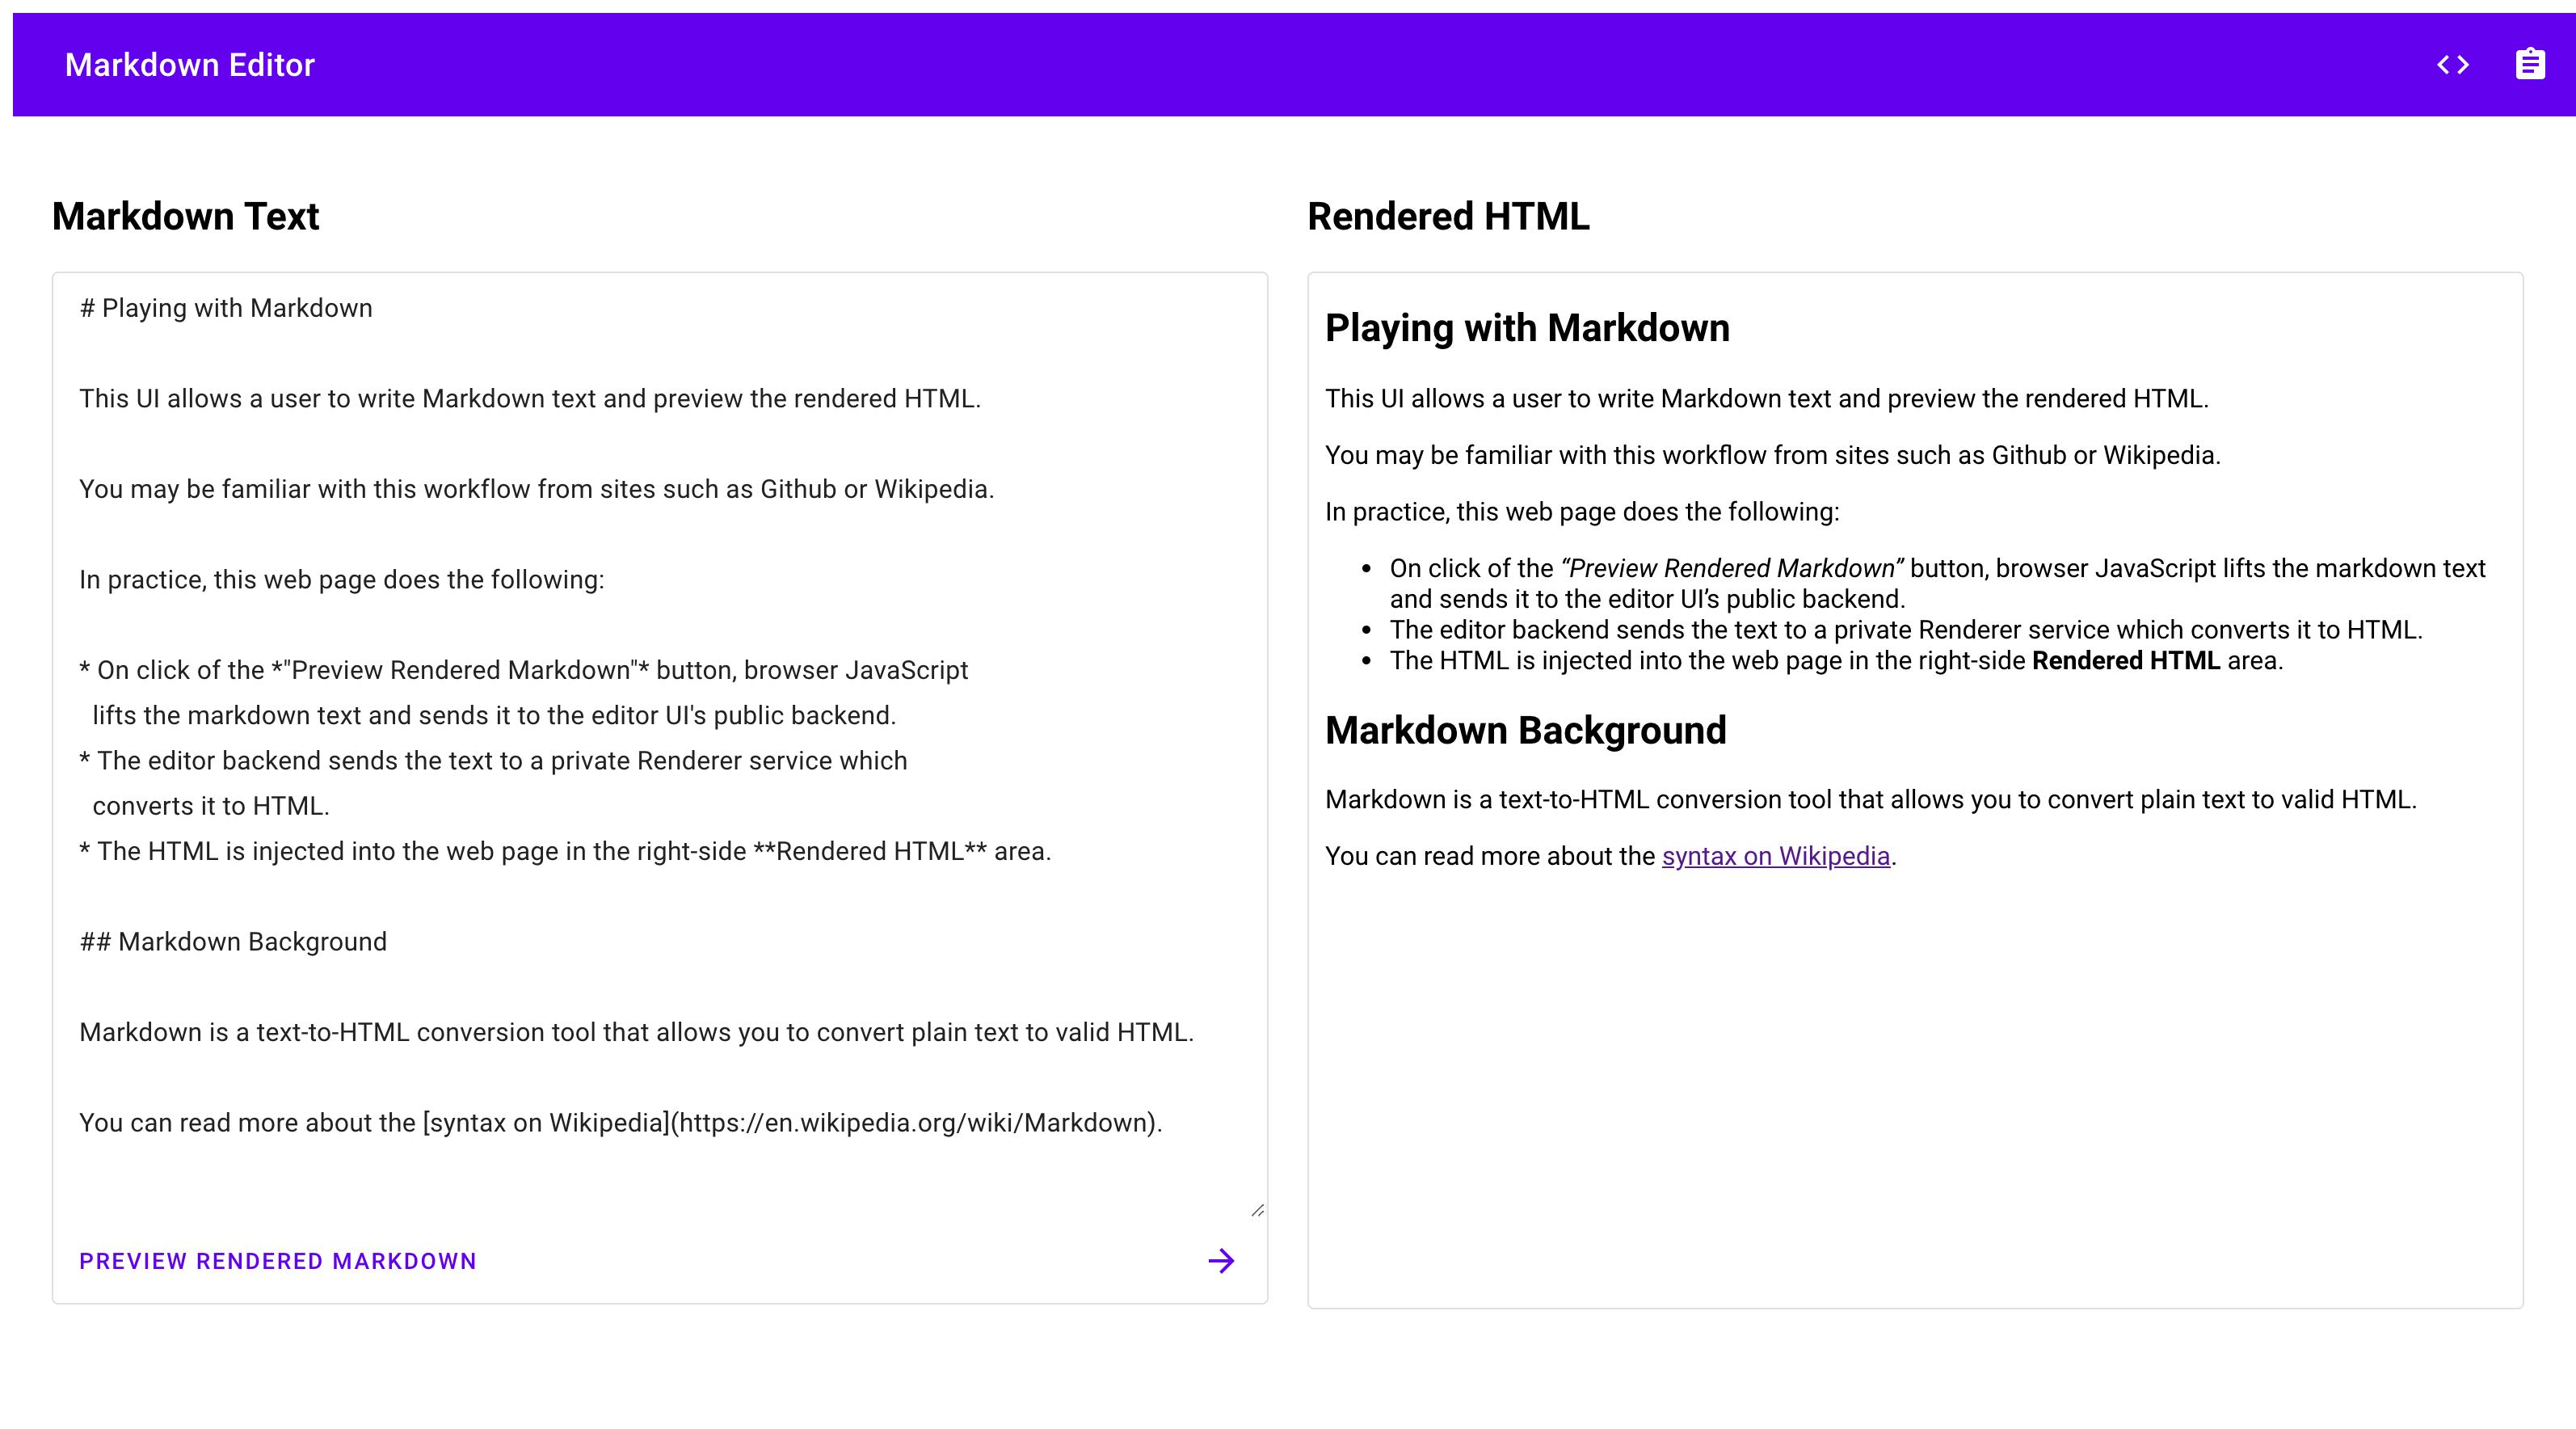 Markdown 编辑器界面的屏幕截图